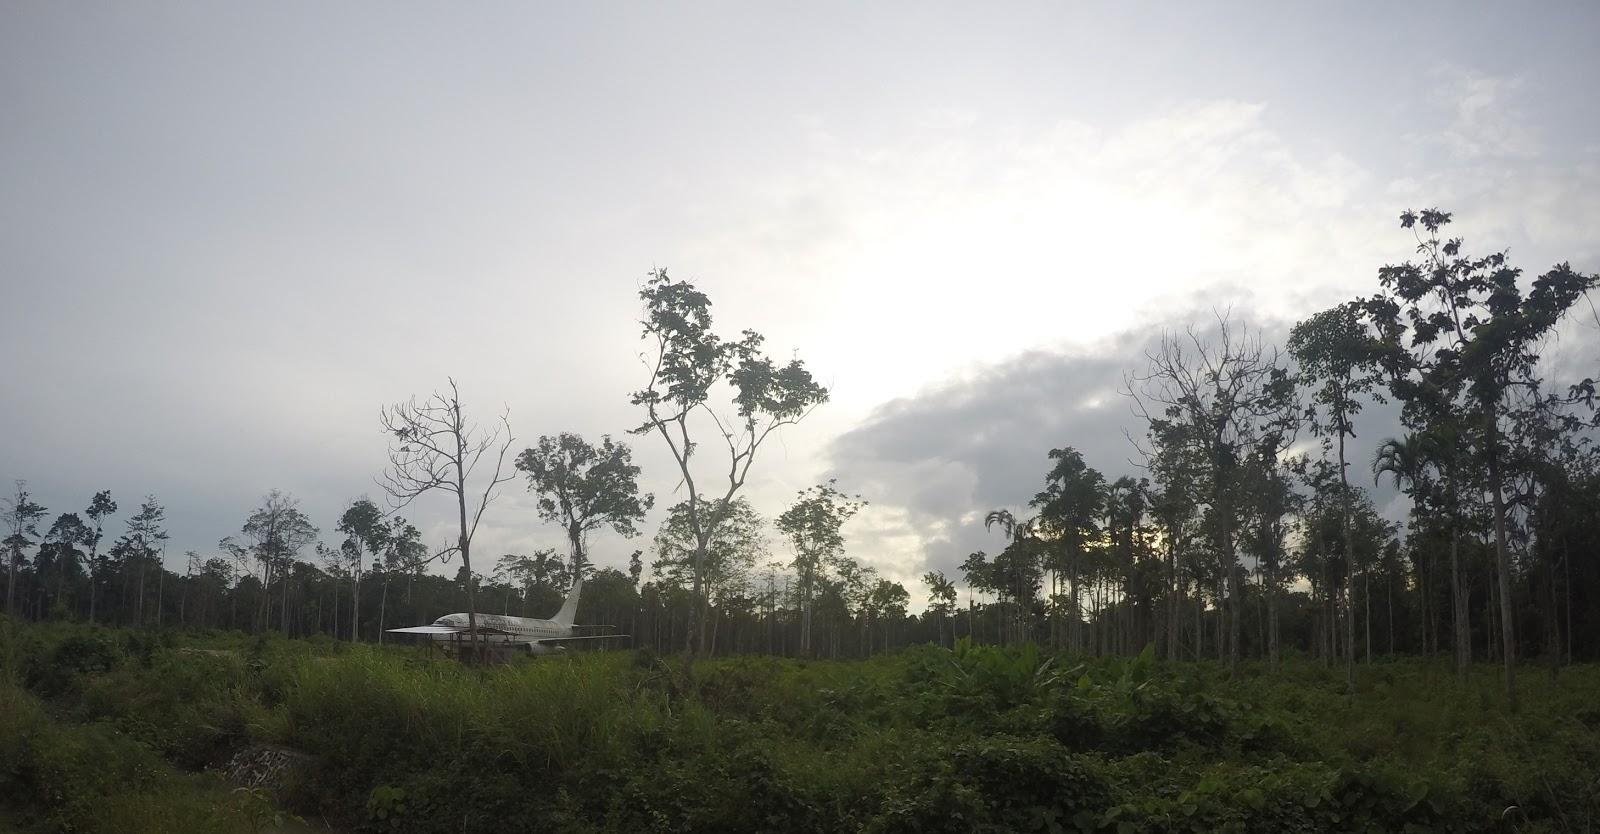 April 2017 Setiawan Mangando Pesawat Tengah Hutan Kab Jayapura